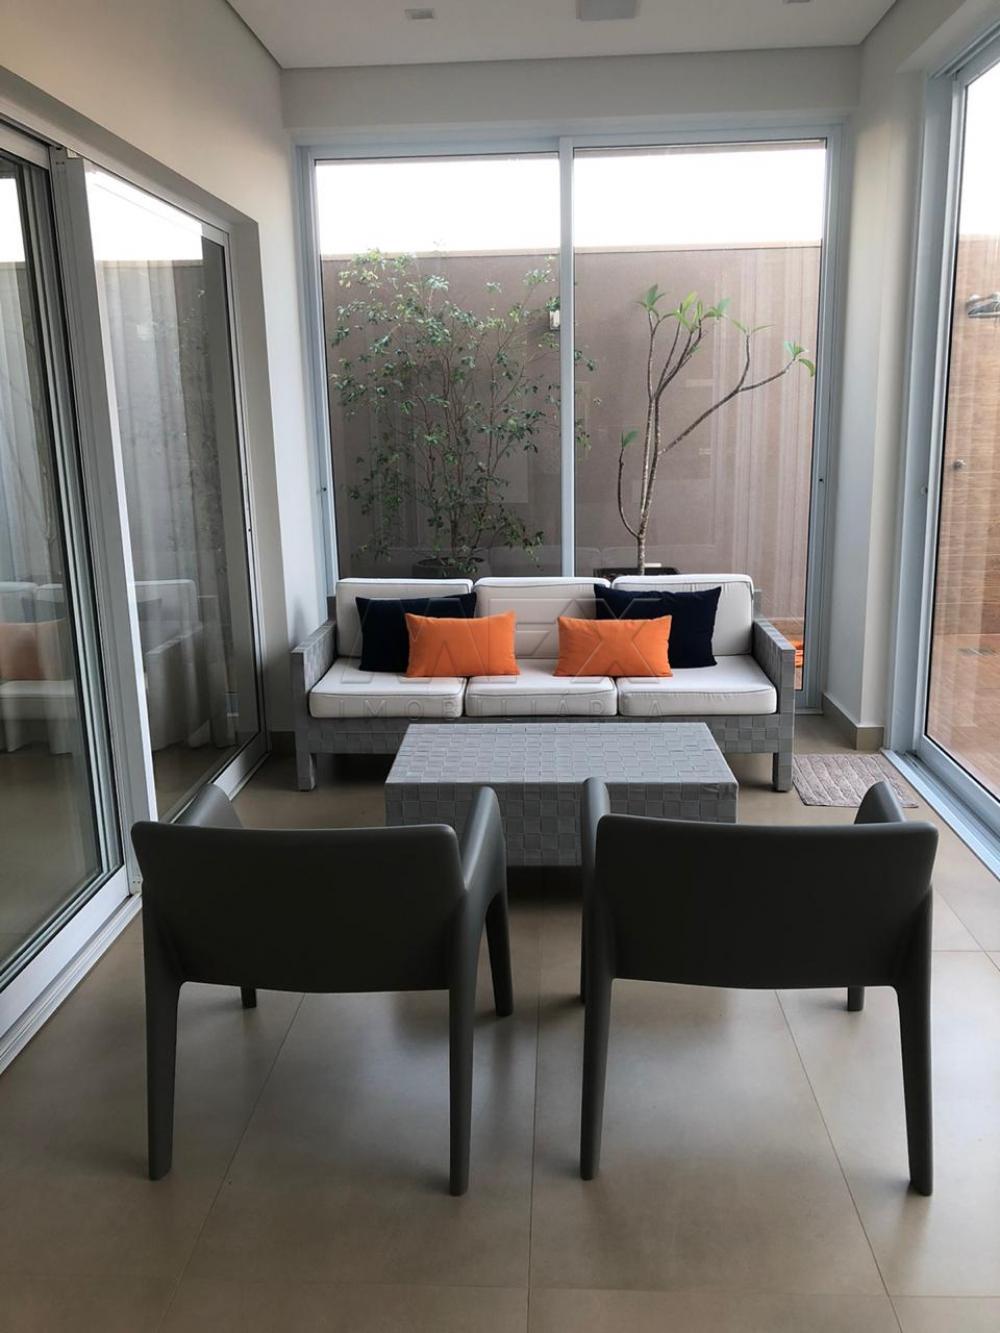 Alugar Casa / Condomínio em Bauru apenas R$ 9.000,00 - Foto 5